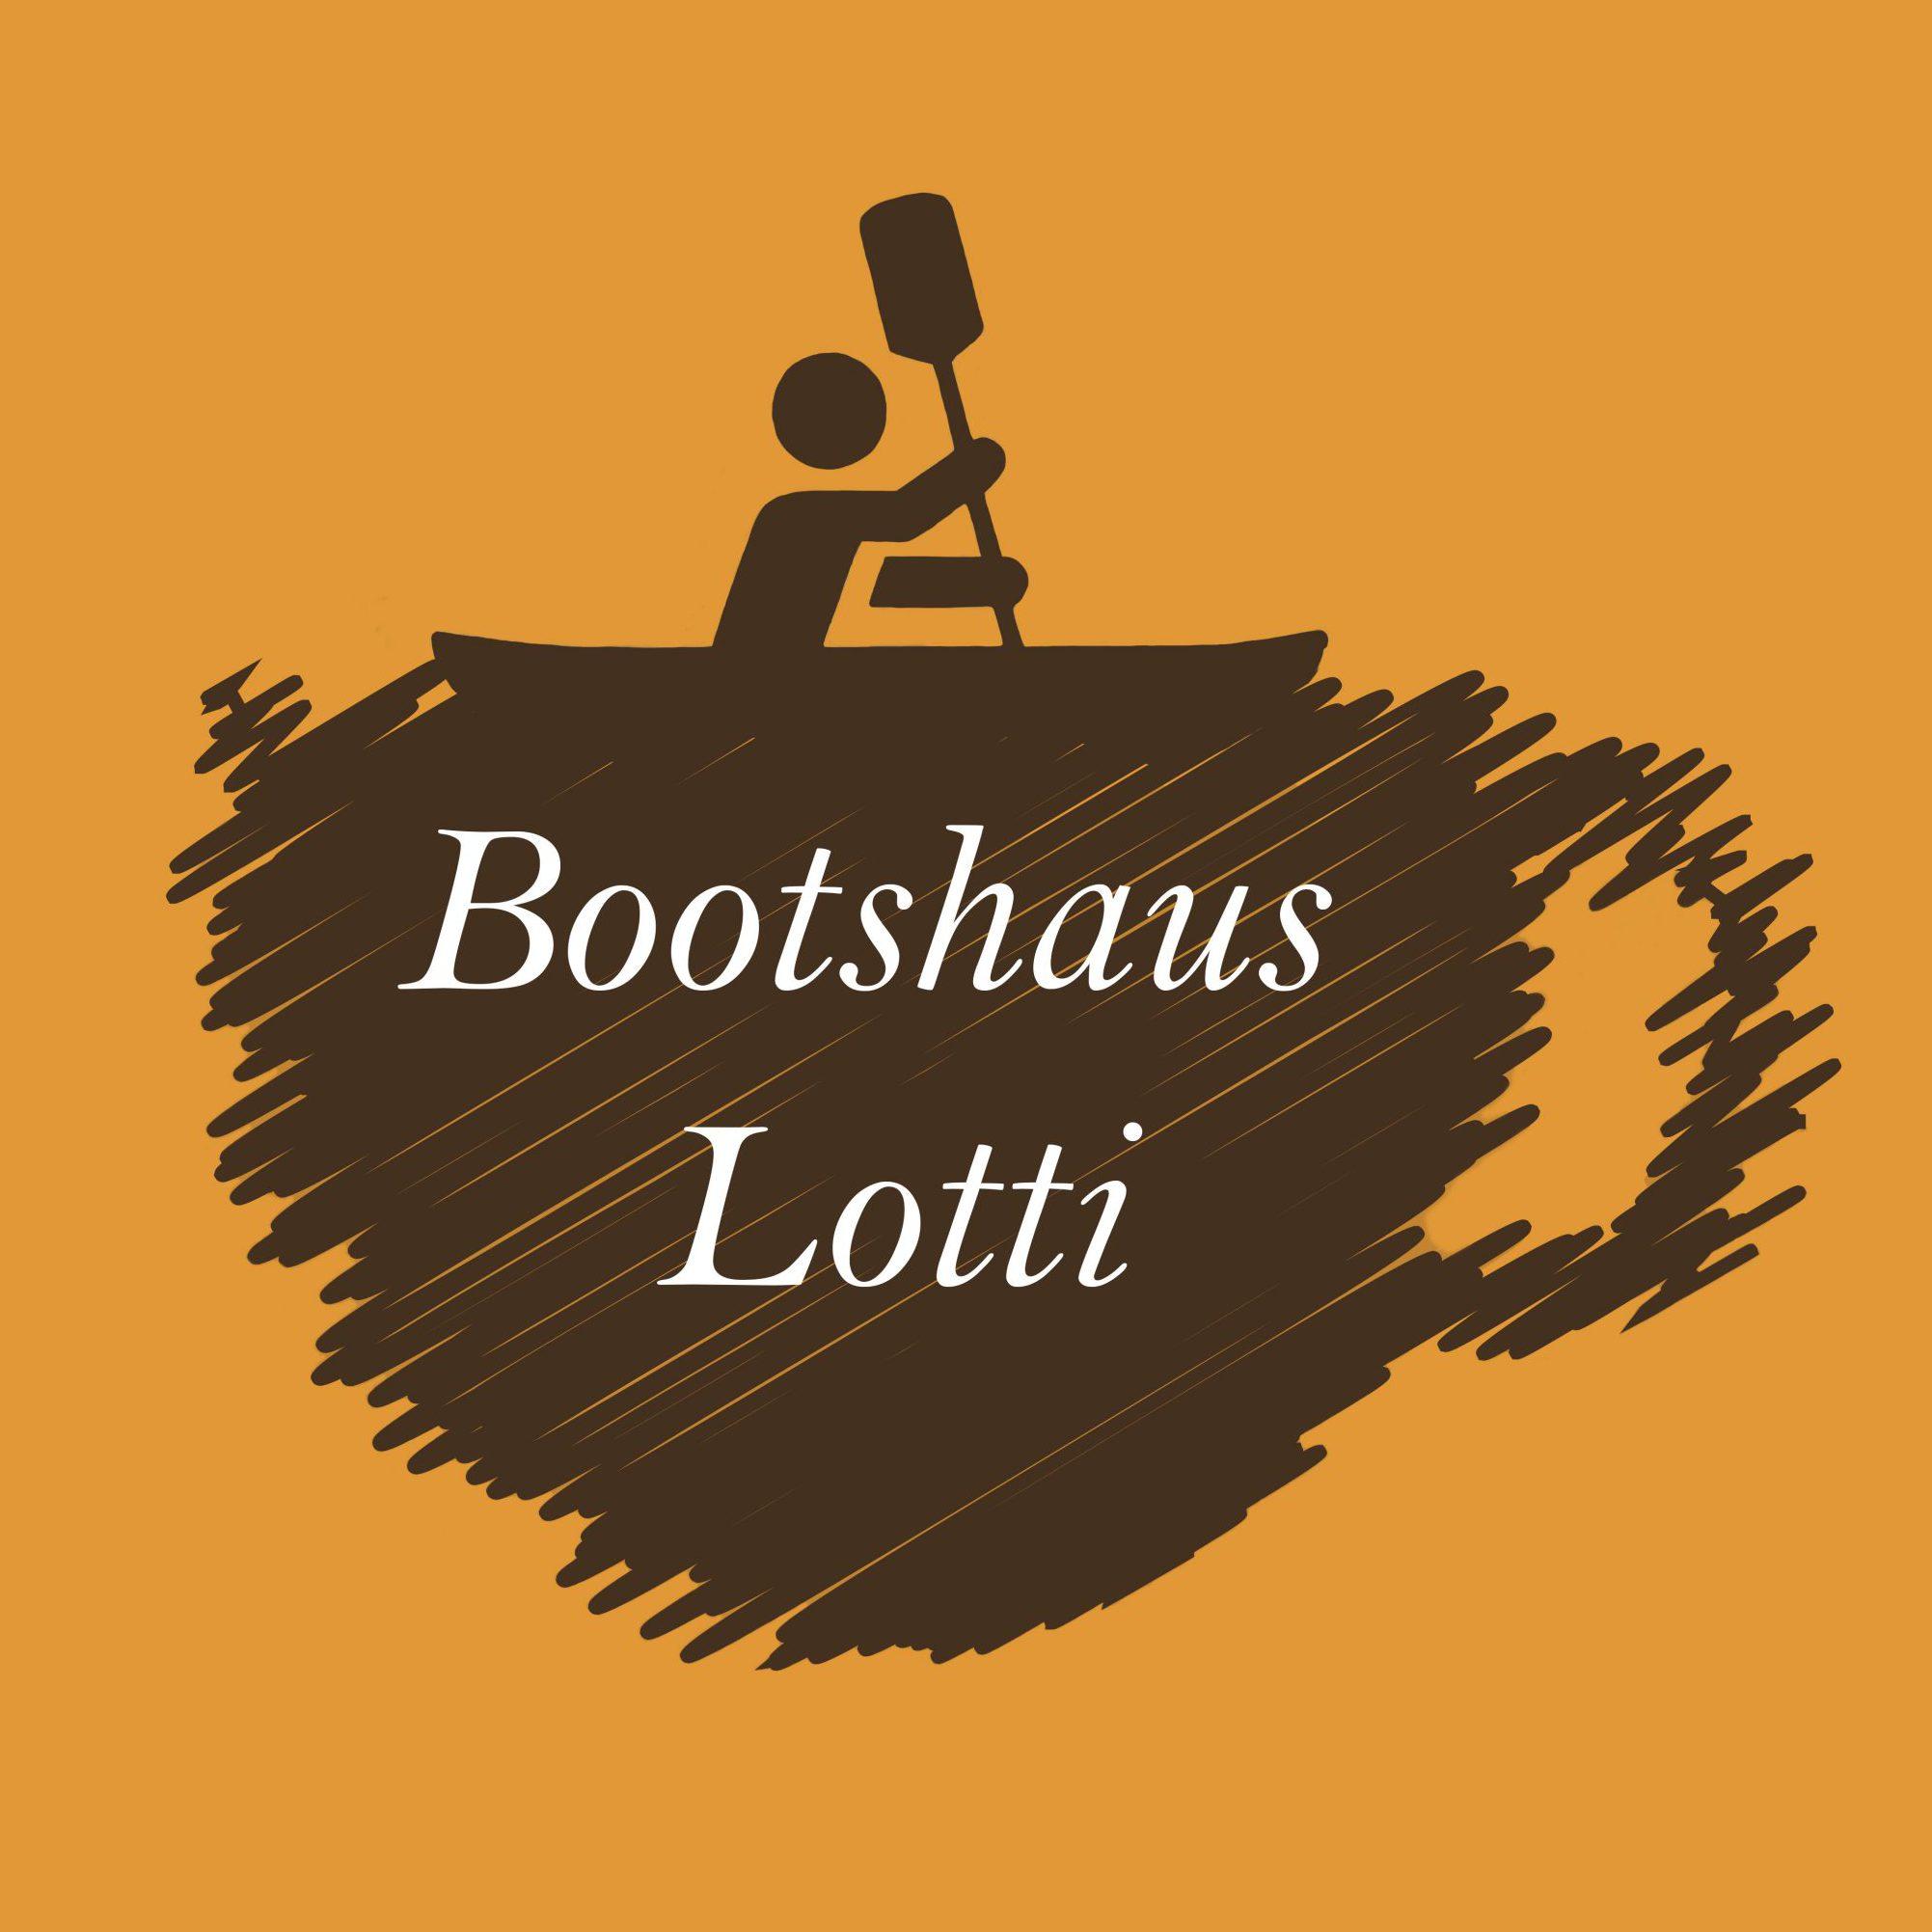 Bootshaus Lotti